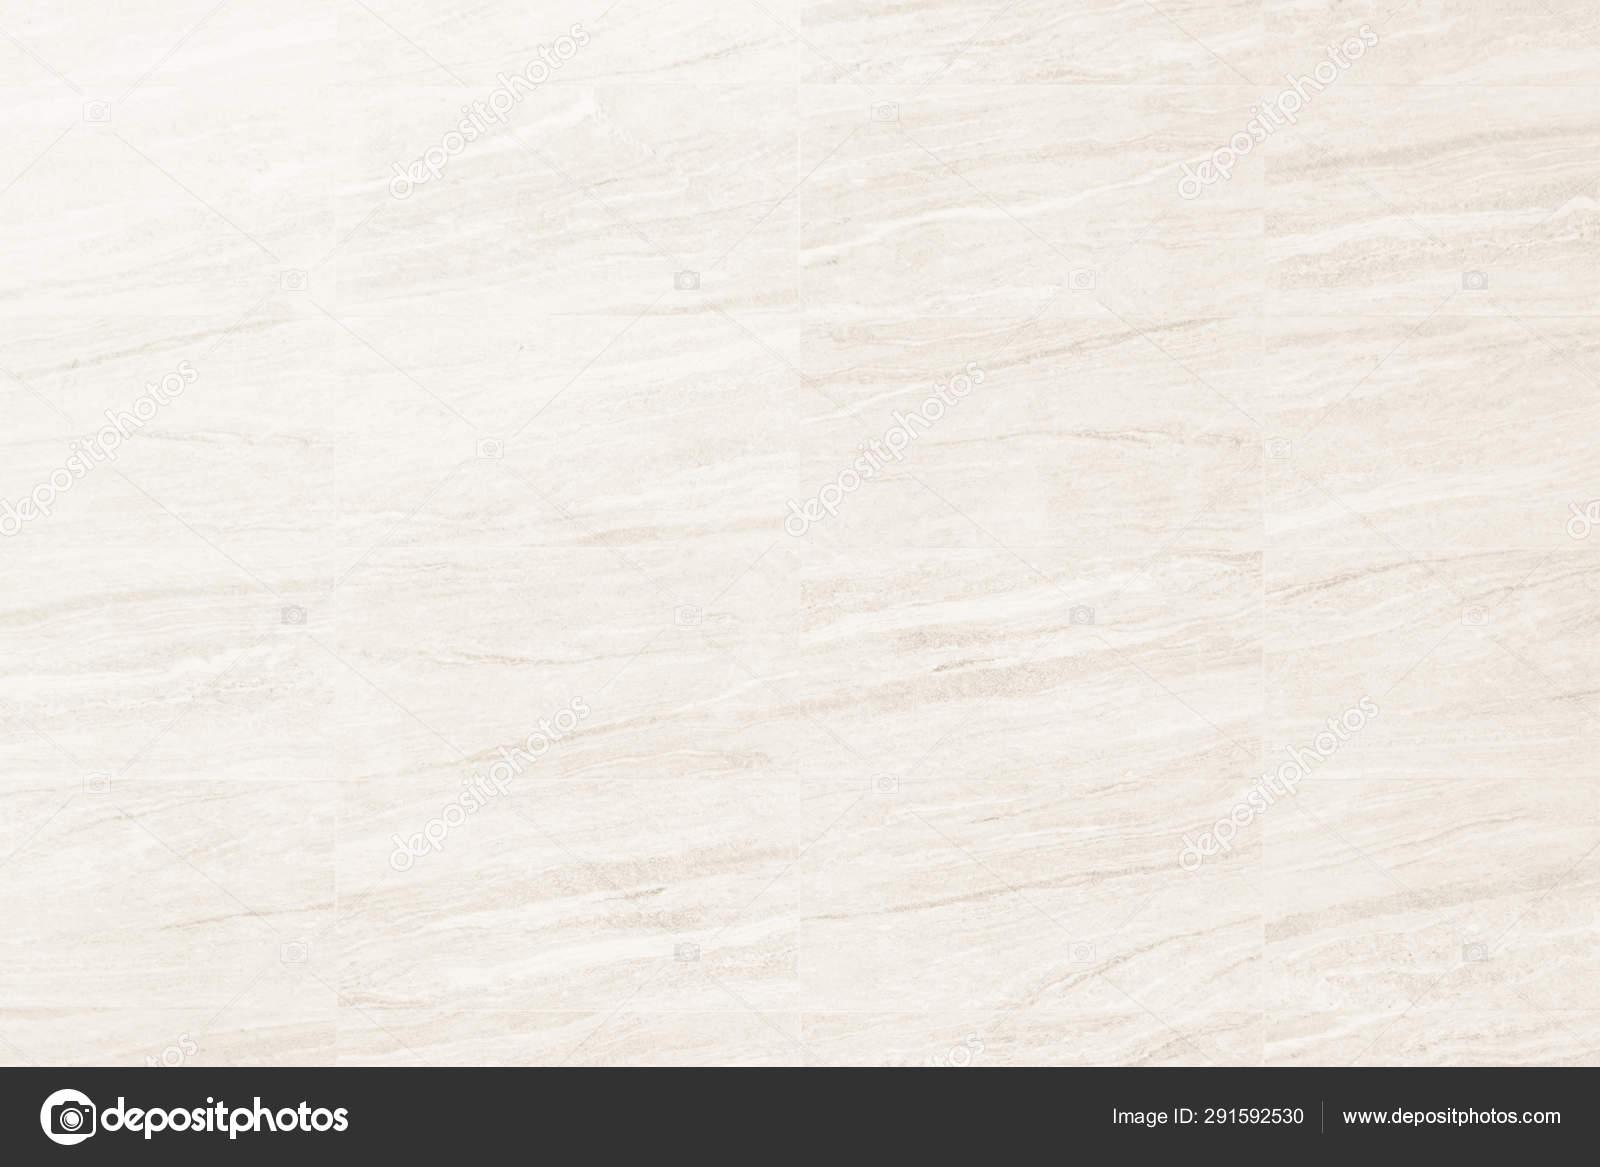 Cream Granite Texture And Background Or Slate Tile Ceramic Seam Stock Photo C Phokin2516 Gmail Com 291592530